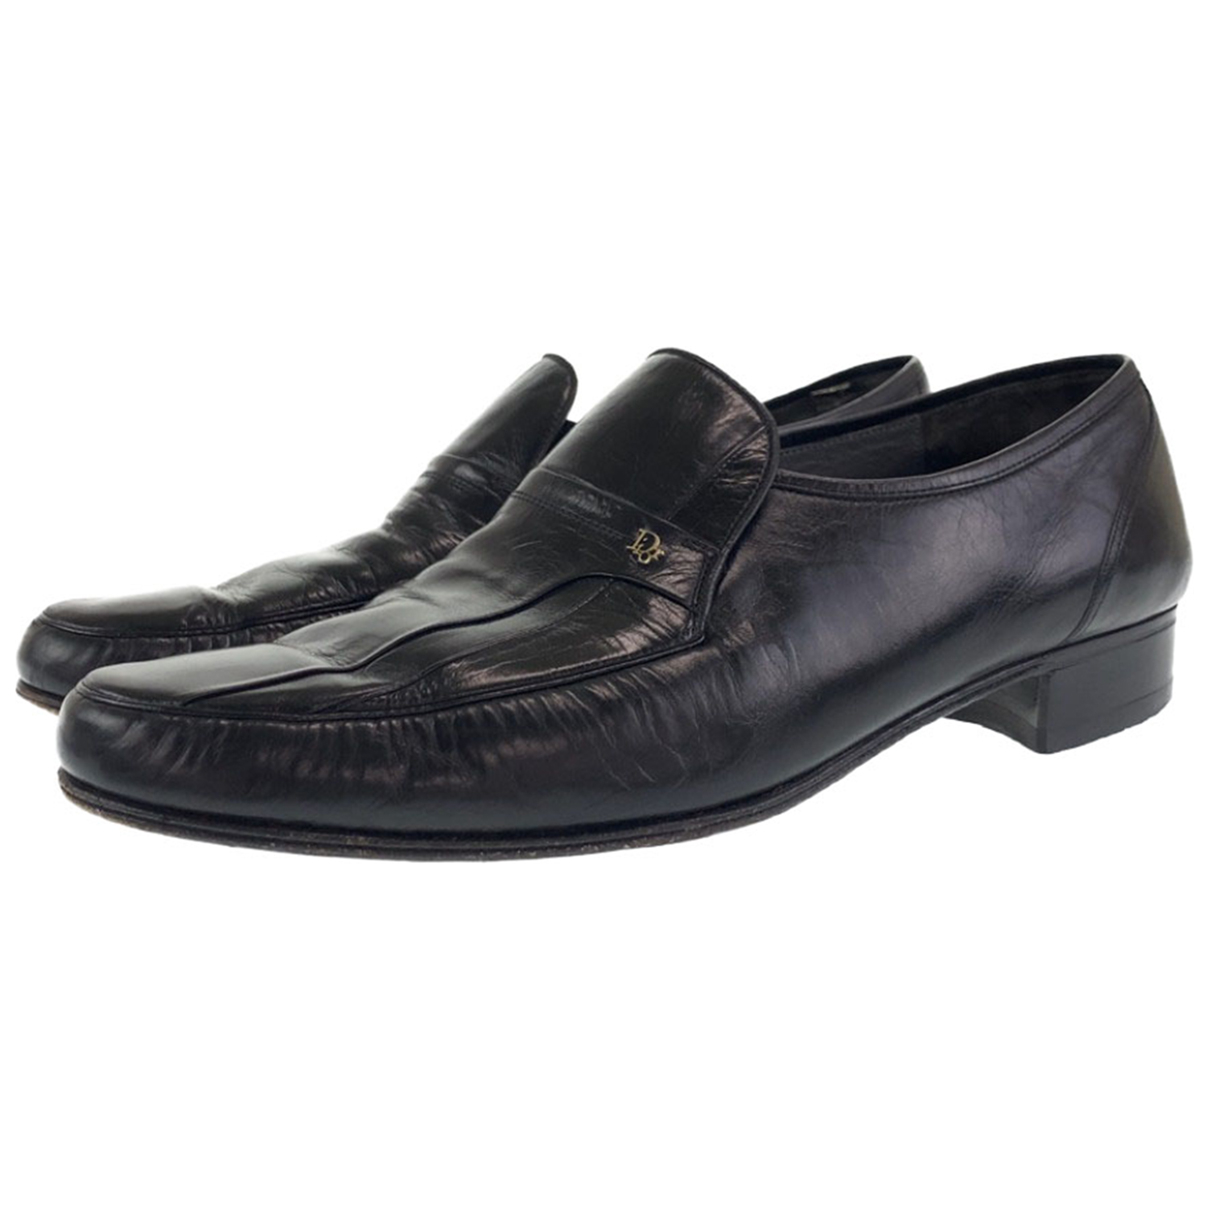 Christian Dior N Leather Flats for Men 43 EU